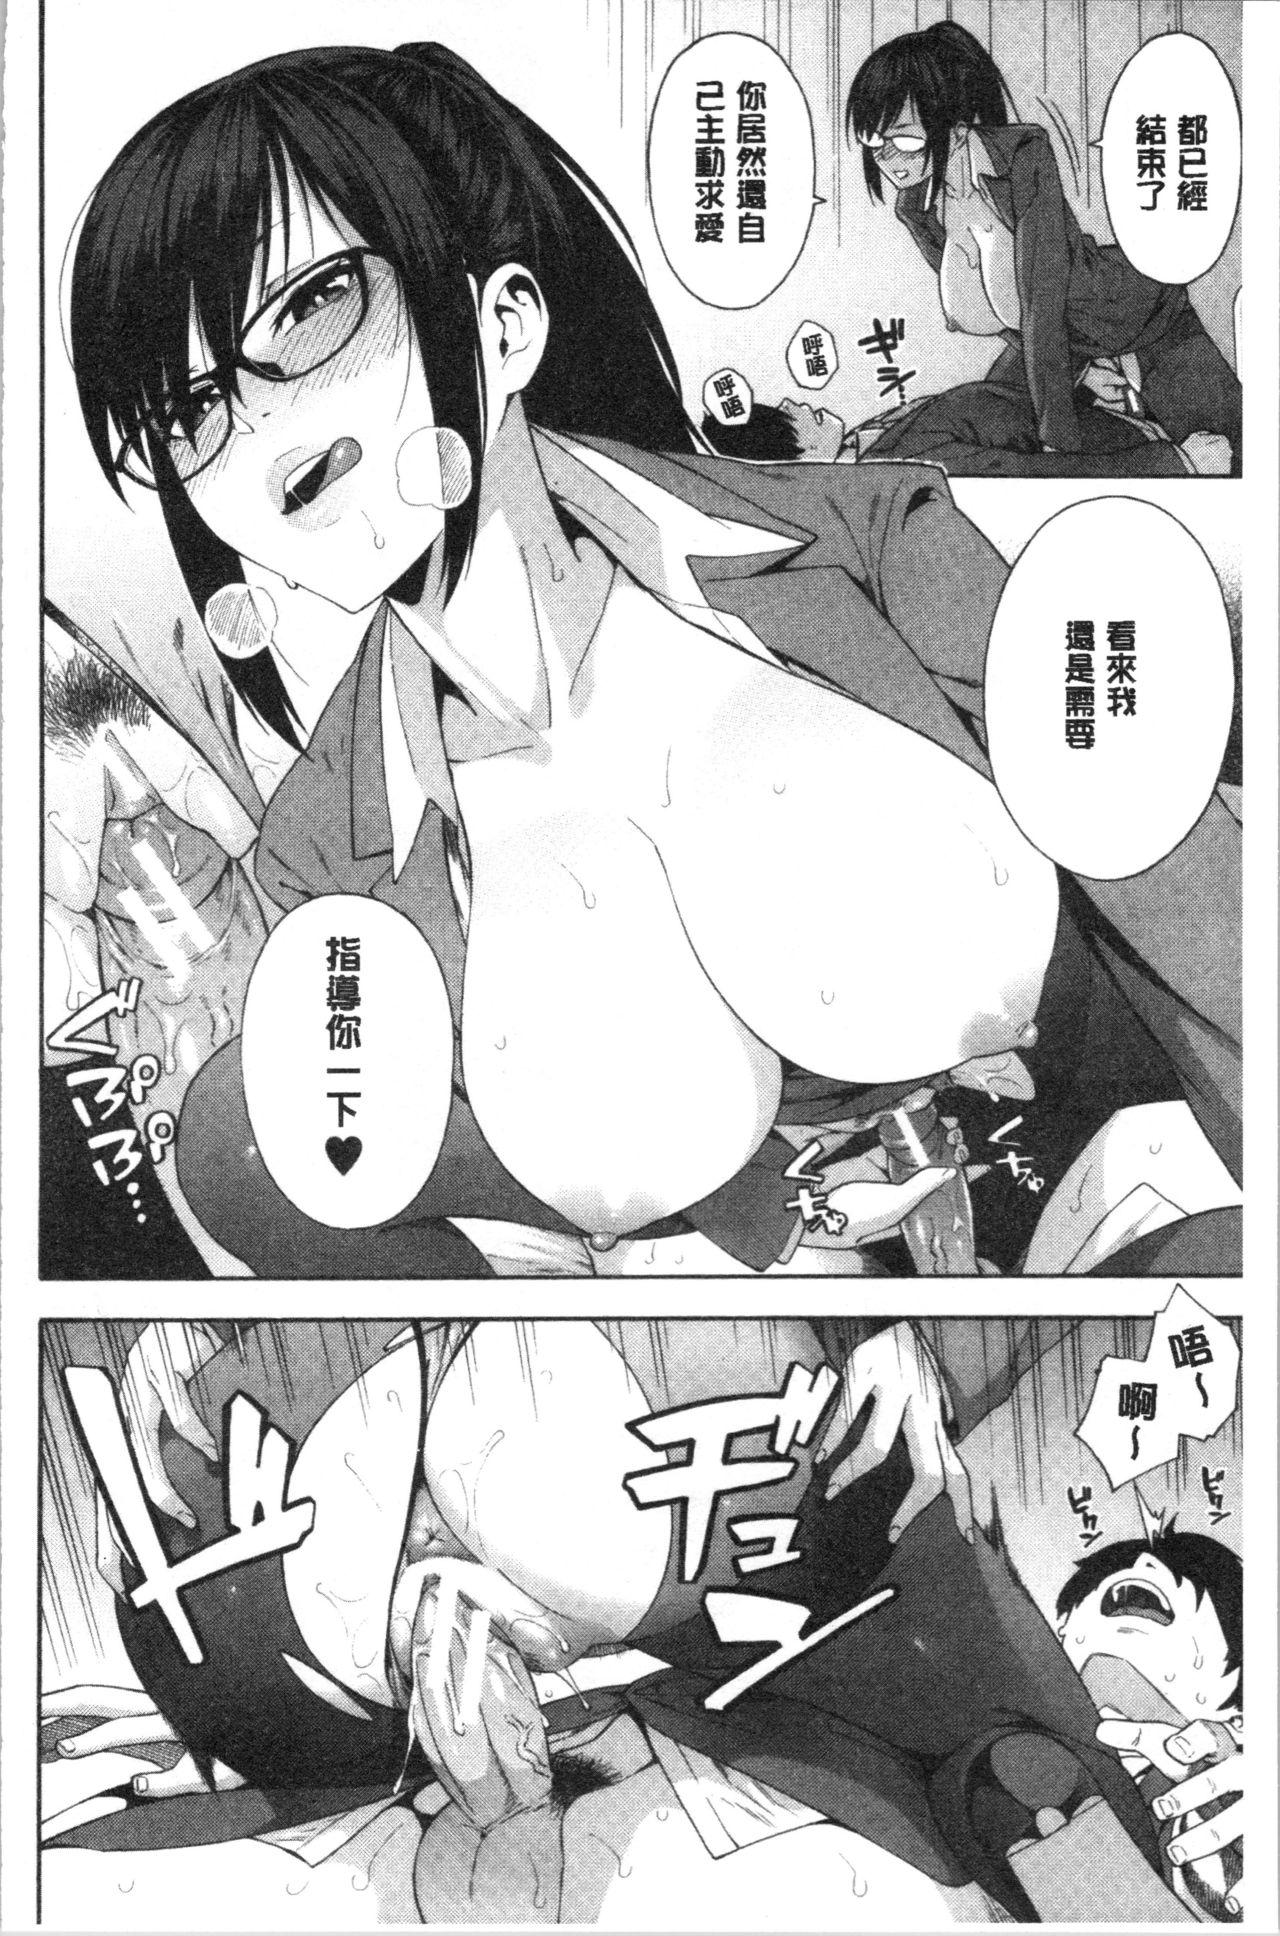 Okashite Ageru | 讓你來侵犯我 70